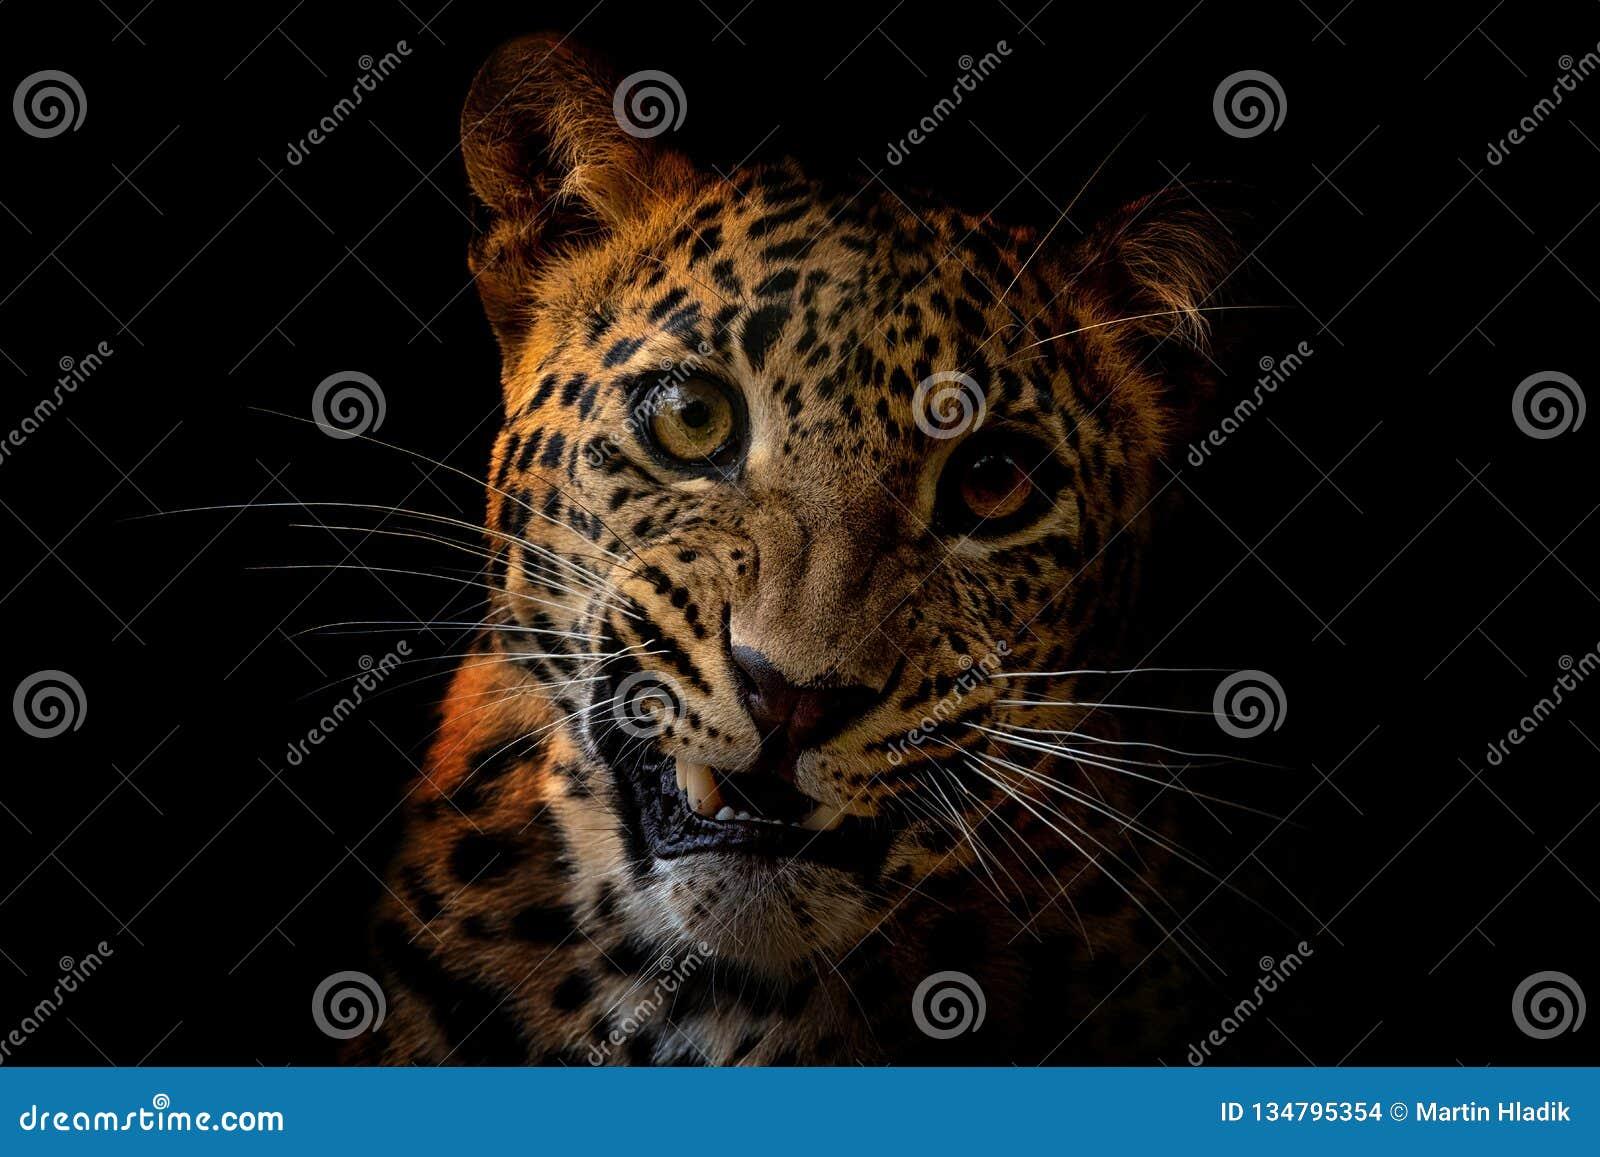 Ceylon leopard - Panthera pardus kotiya